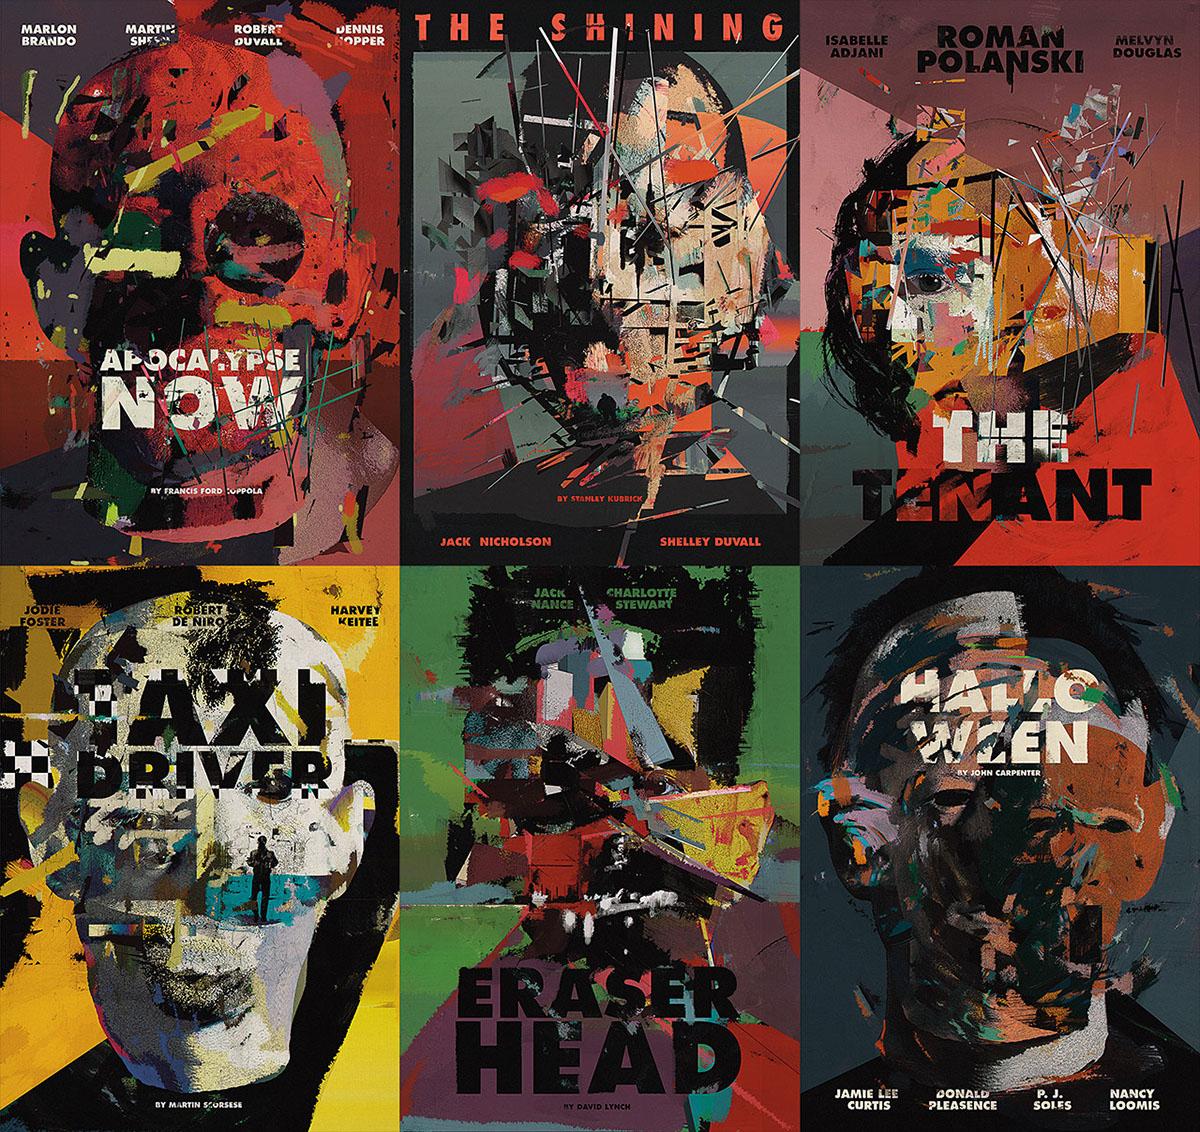 Heads Psychopaths - Sebastian Onufszak